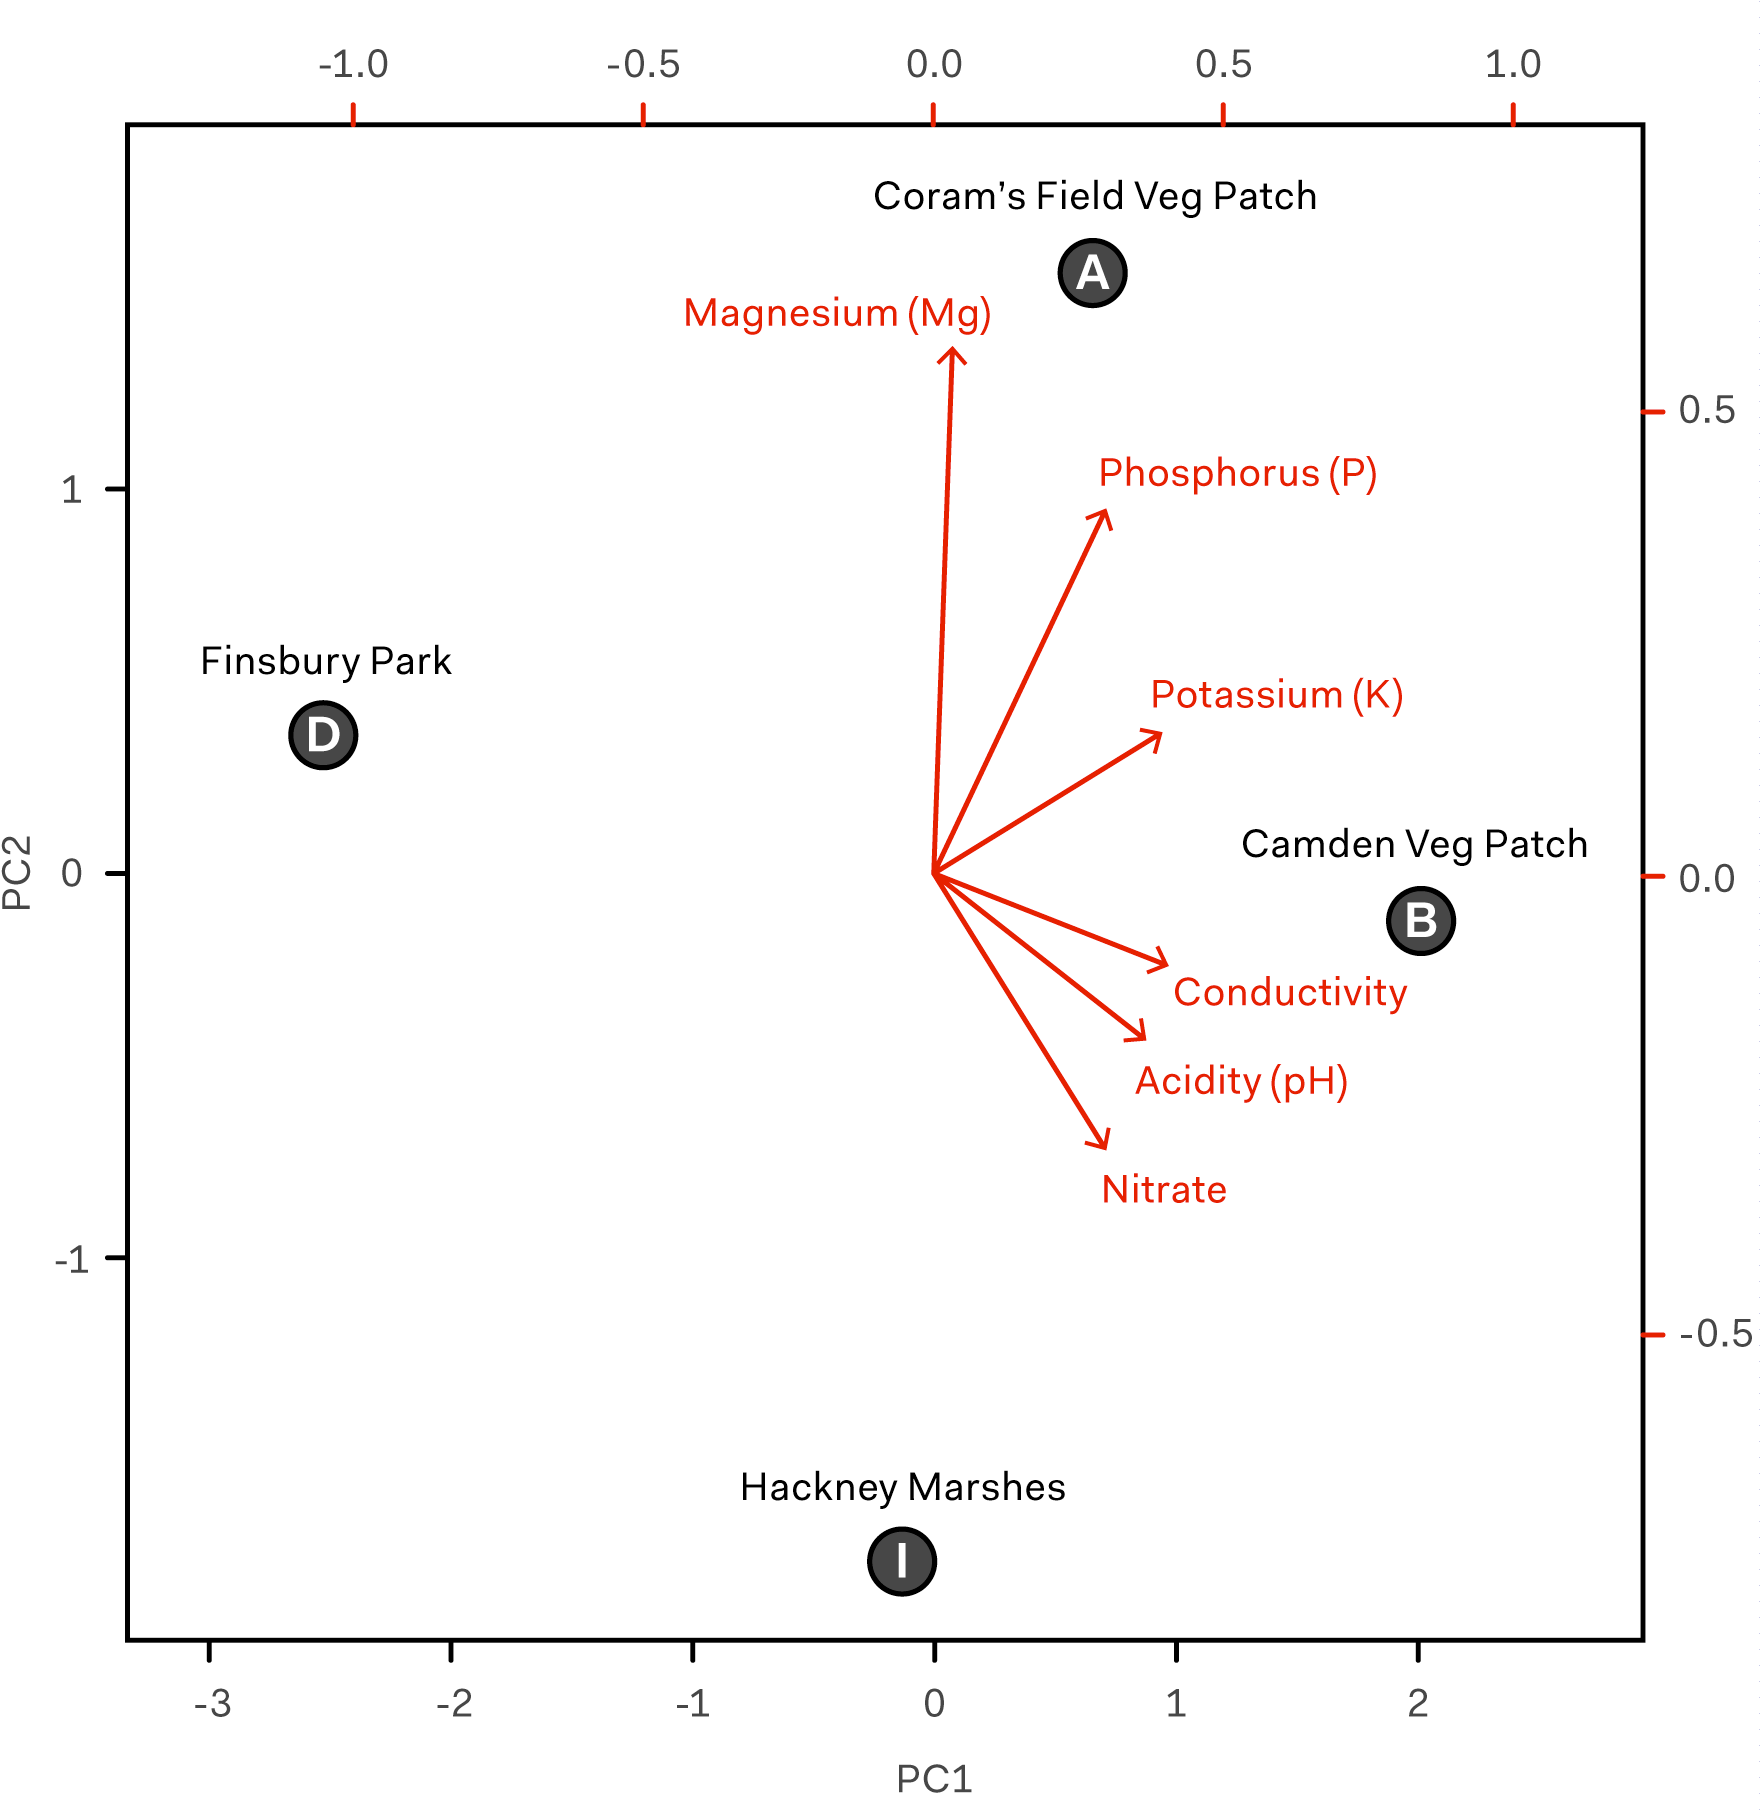 Soil Nutrient Analysis: Nitrogen, Phosphorus, and Potassium